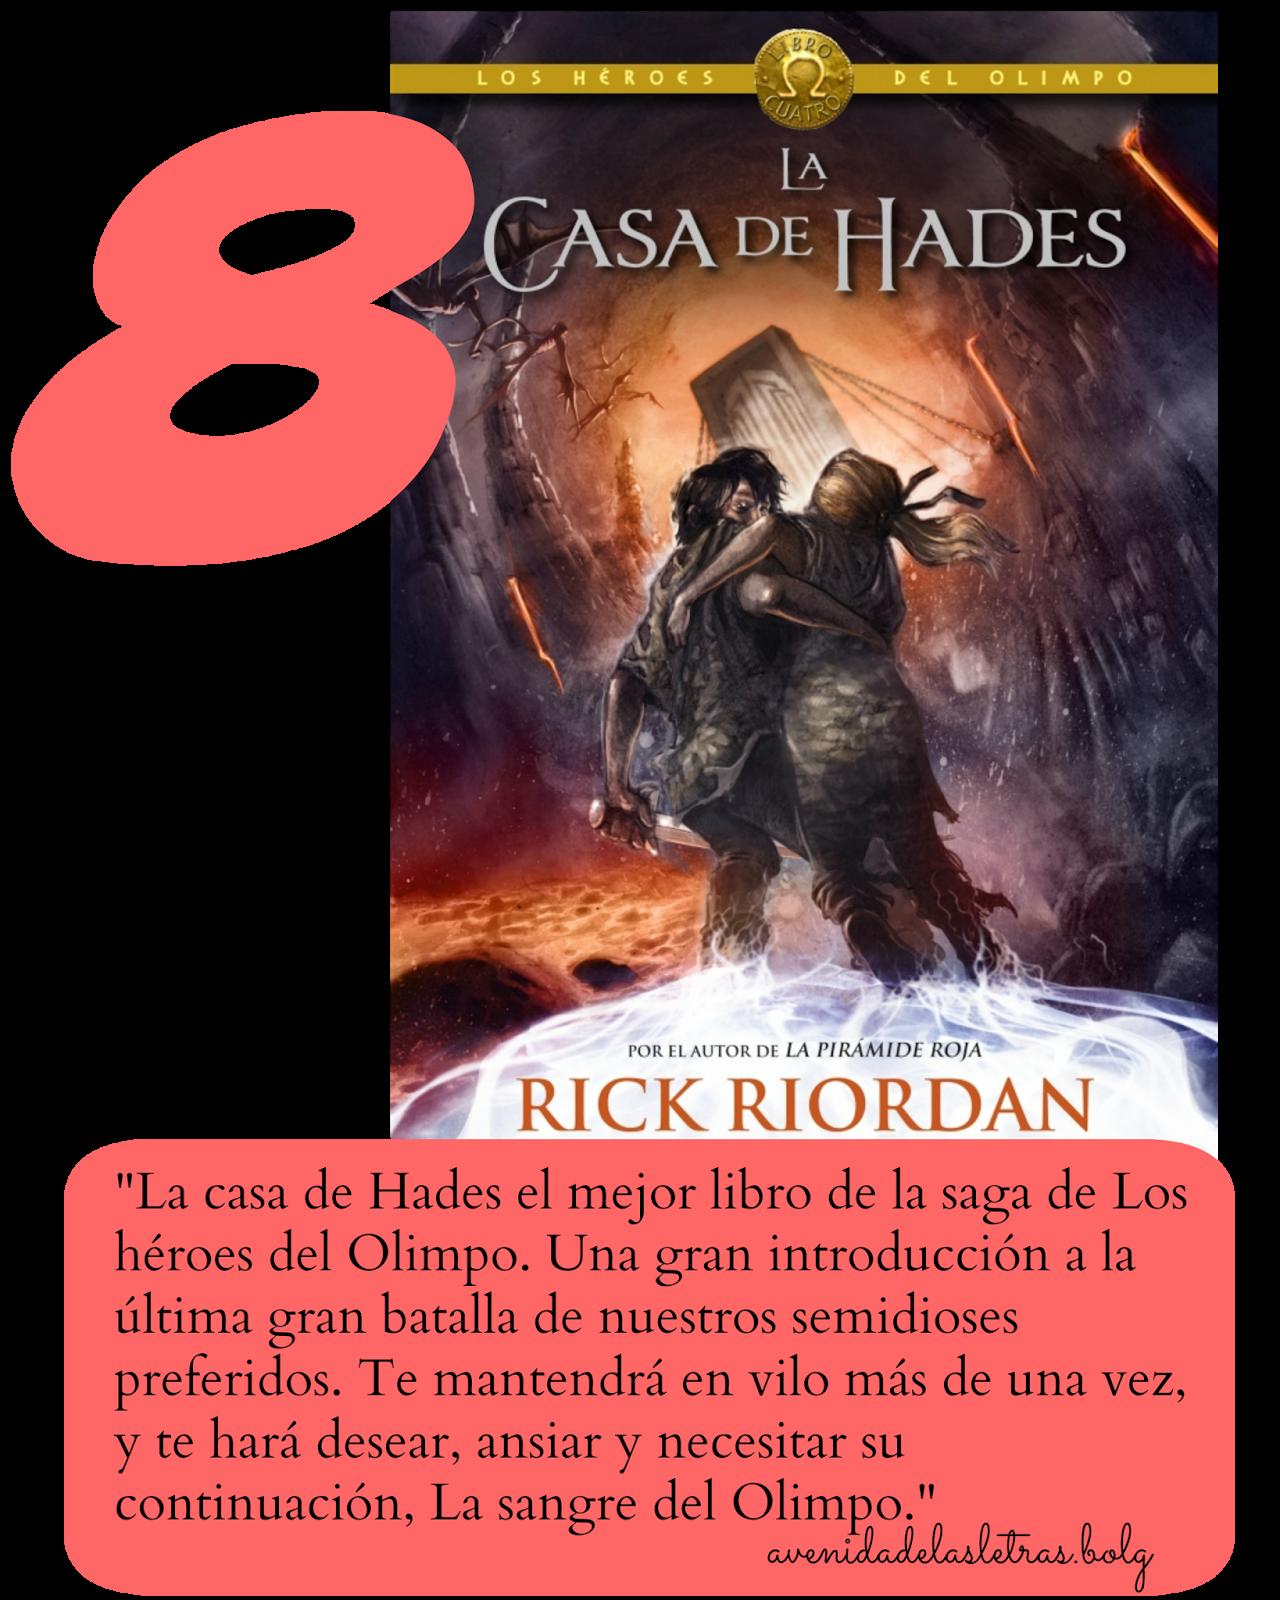 http://avenidadelasletras.blogspot.com.es/2014/10/resena-la-casa-de-hades-de-rick-riordan.html